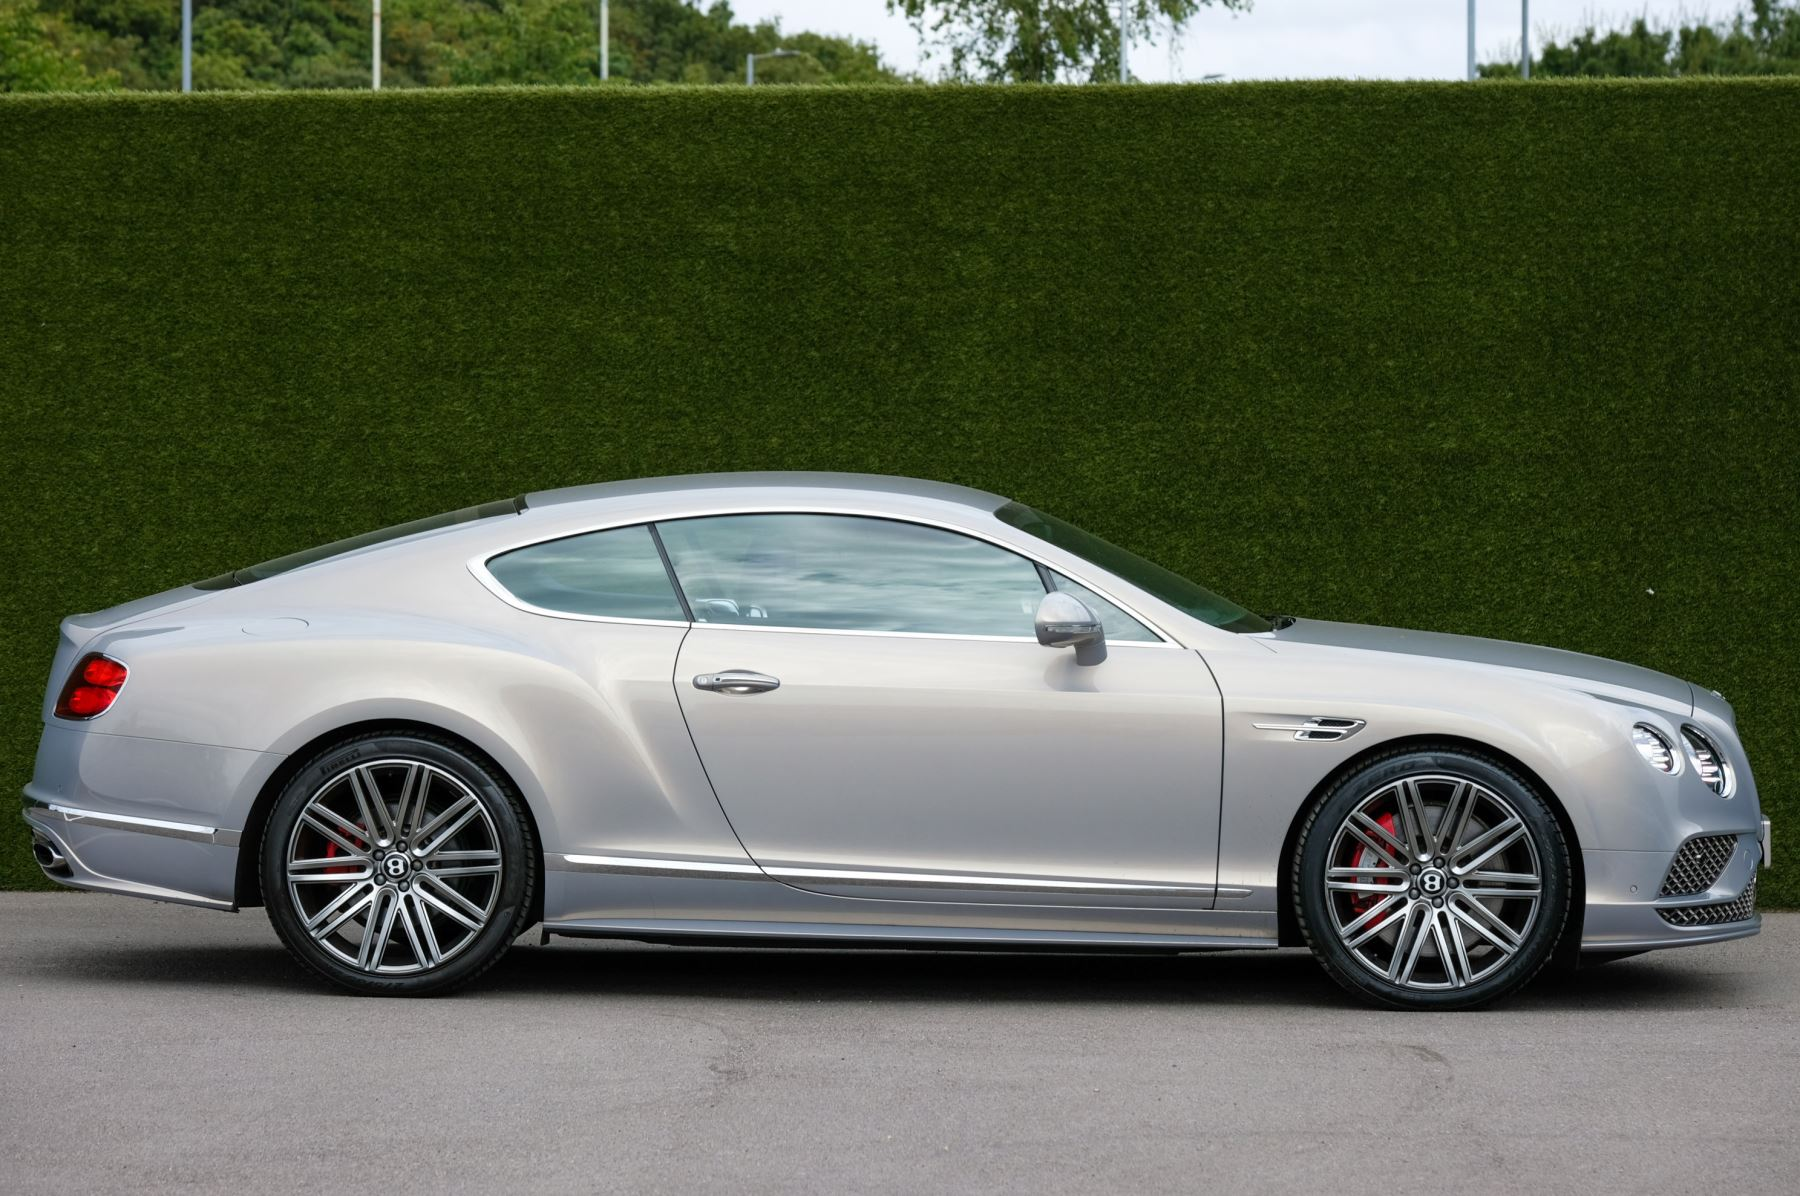 Bentley Continental GT 6.0 W12 [635] Speed - Premier Specification - Carbon Fibre Fascia Panels image 3